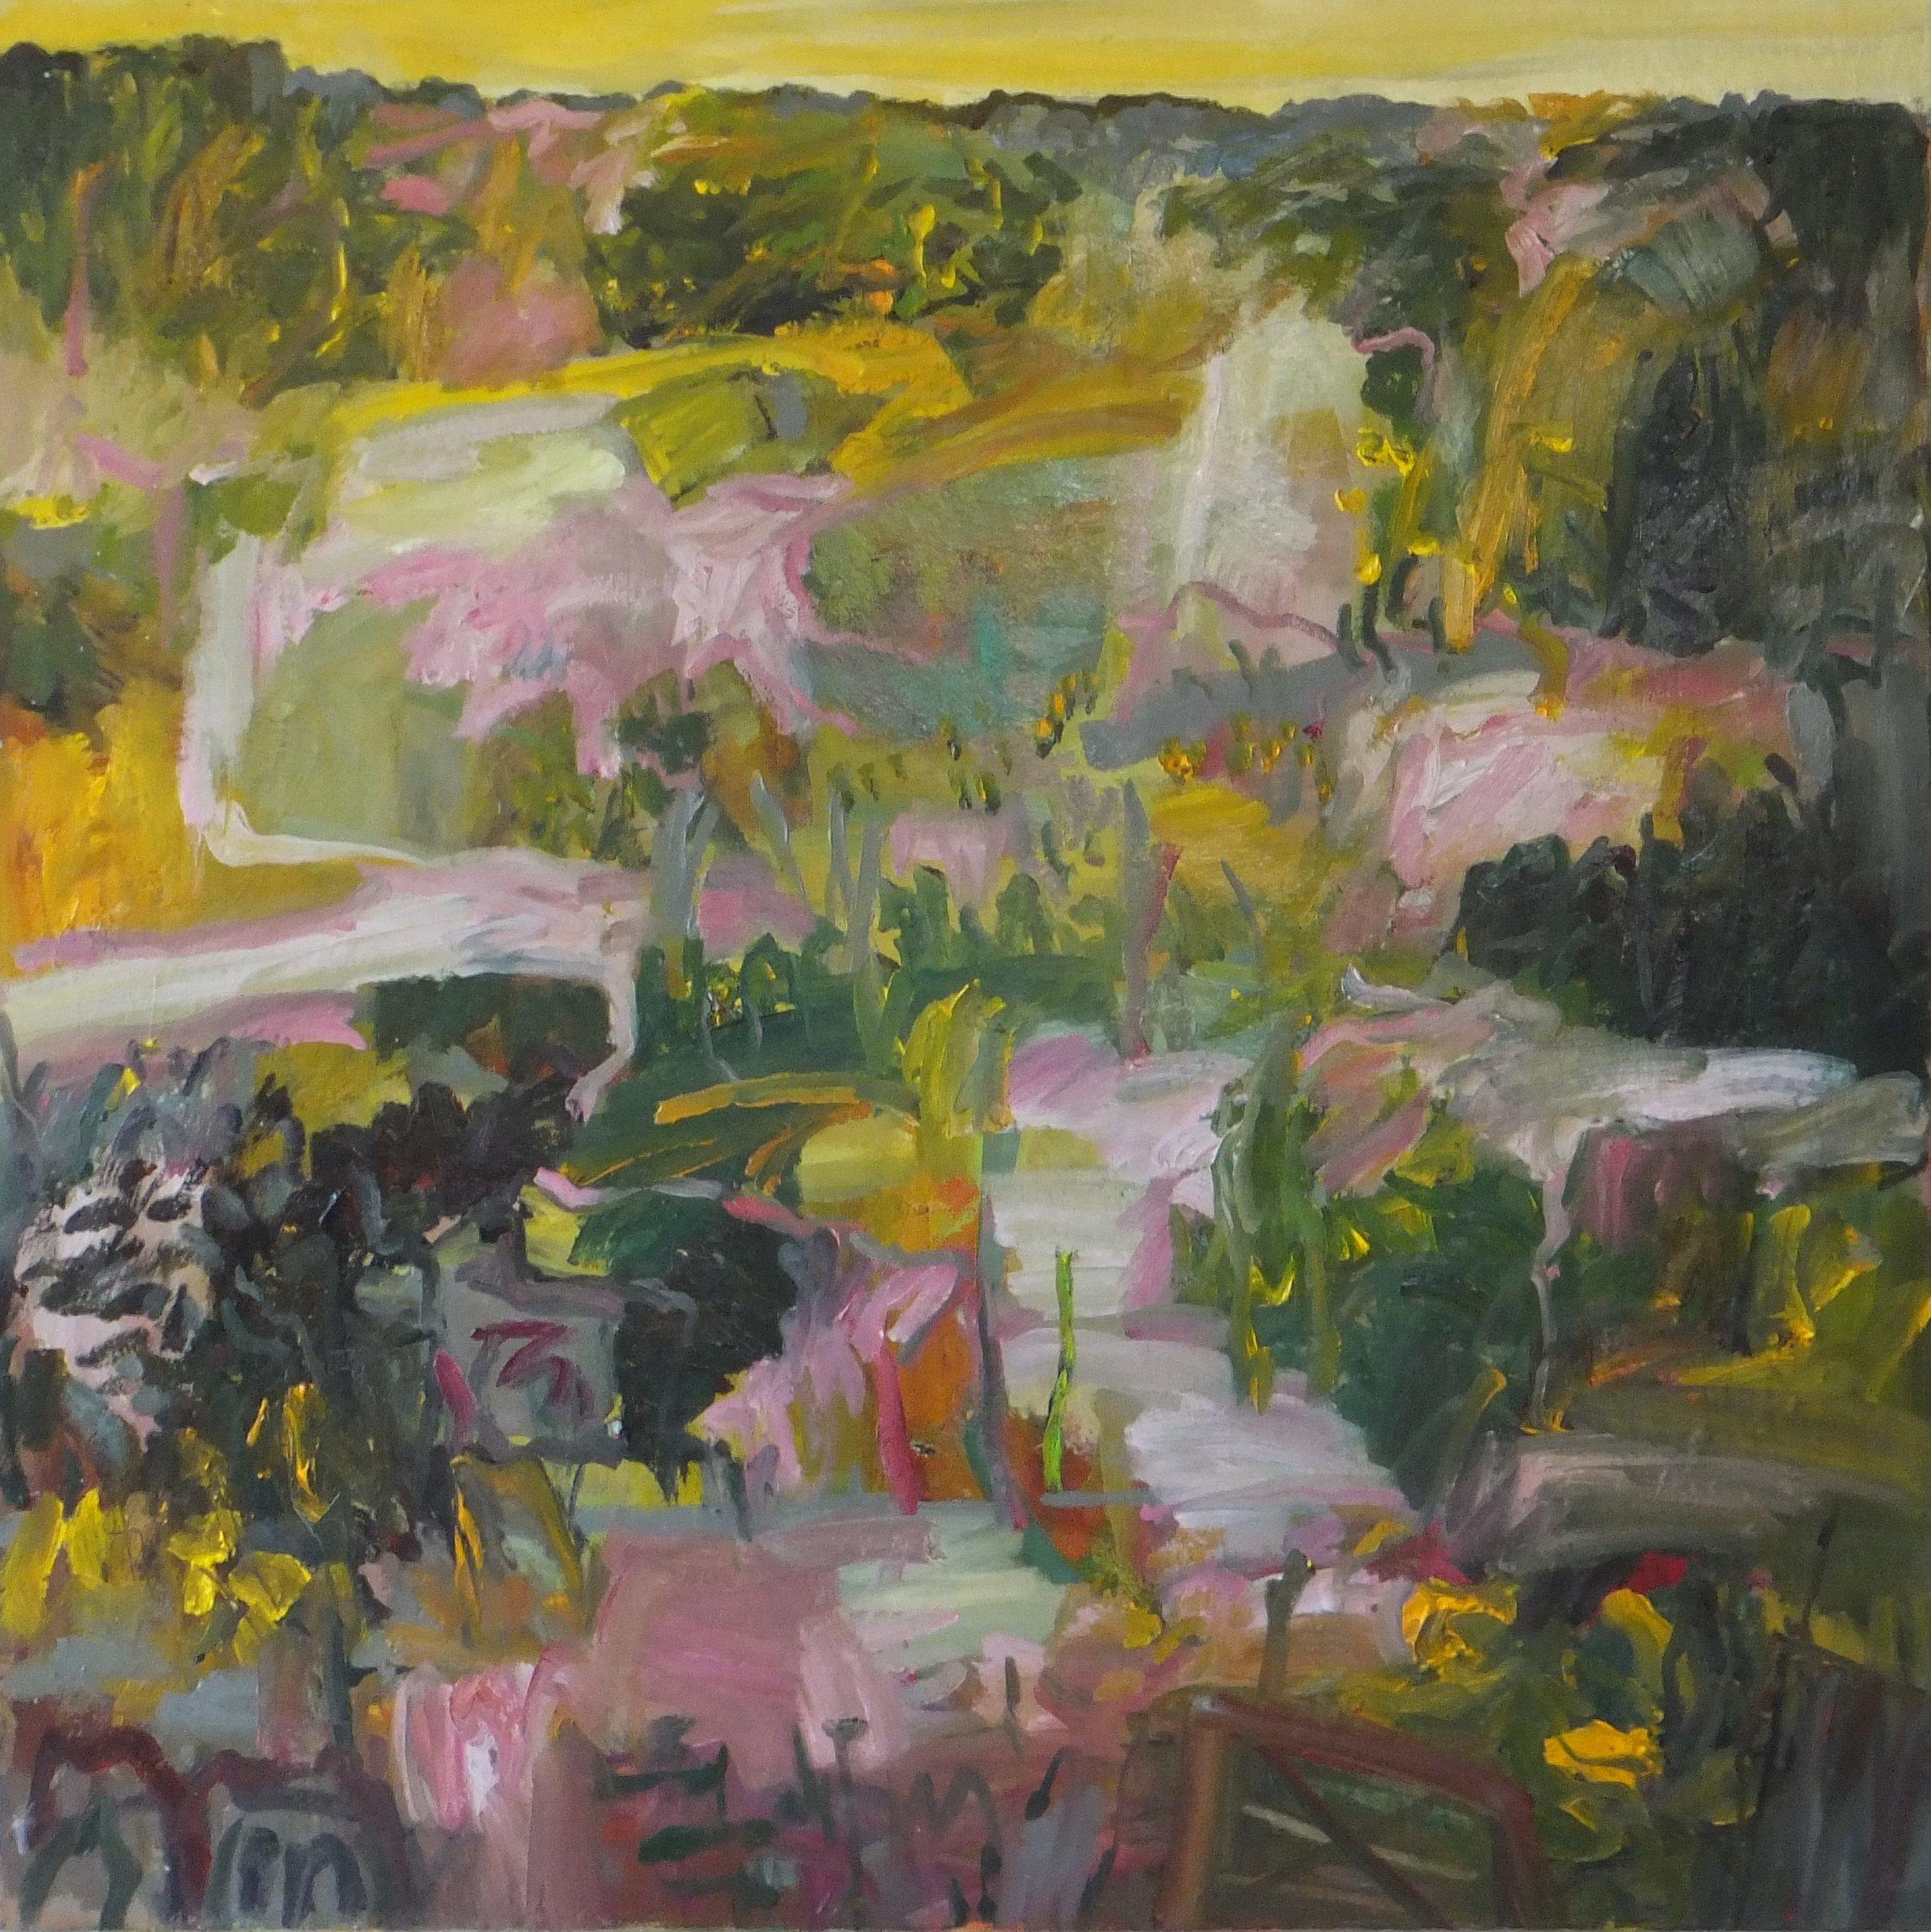 Lydia Miller   Through the Gate  2018  oil on canvas  76 x 76cm  $1200.00